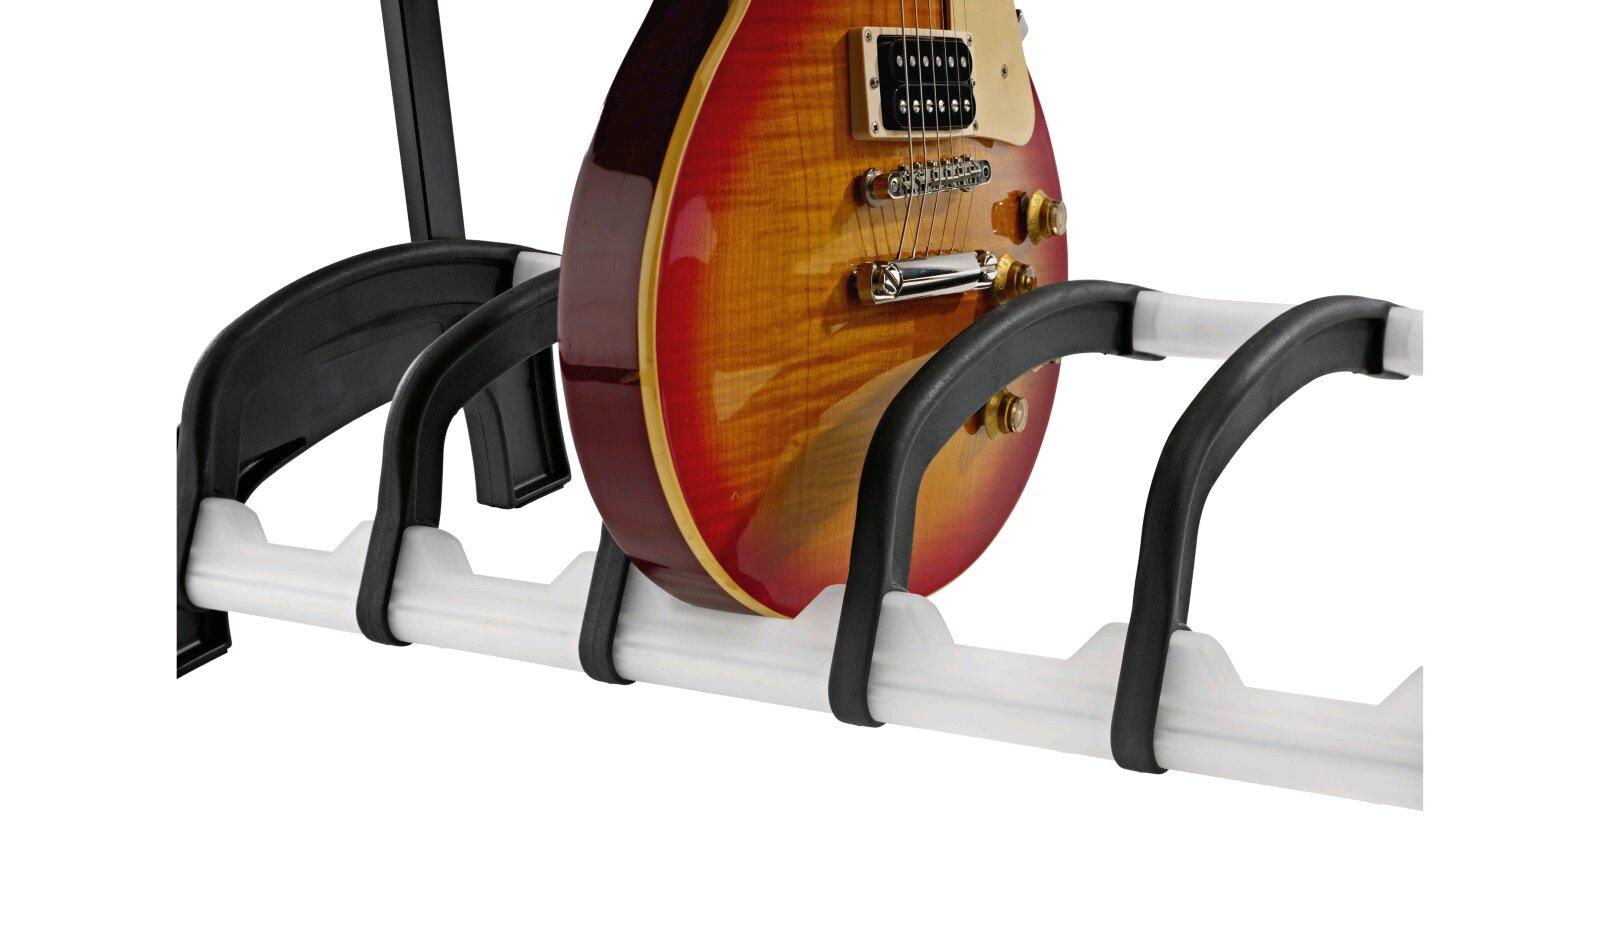 K & M 17525 – e-guitar stand Guardian 5 – Translucide : photo 3